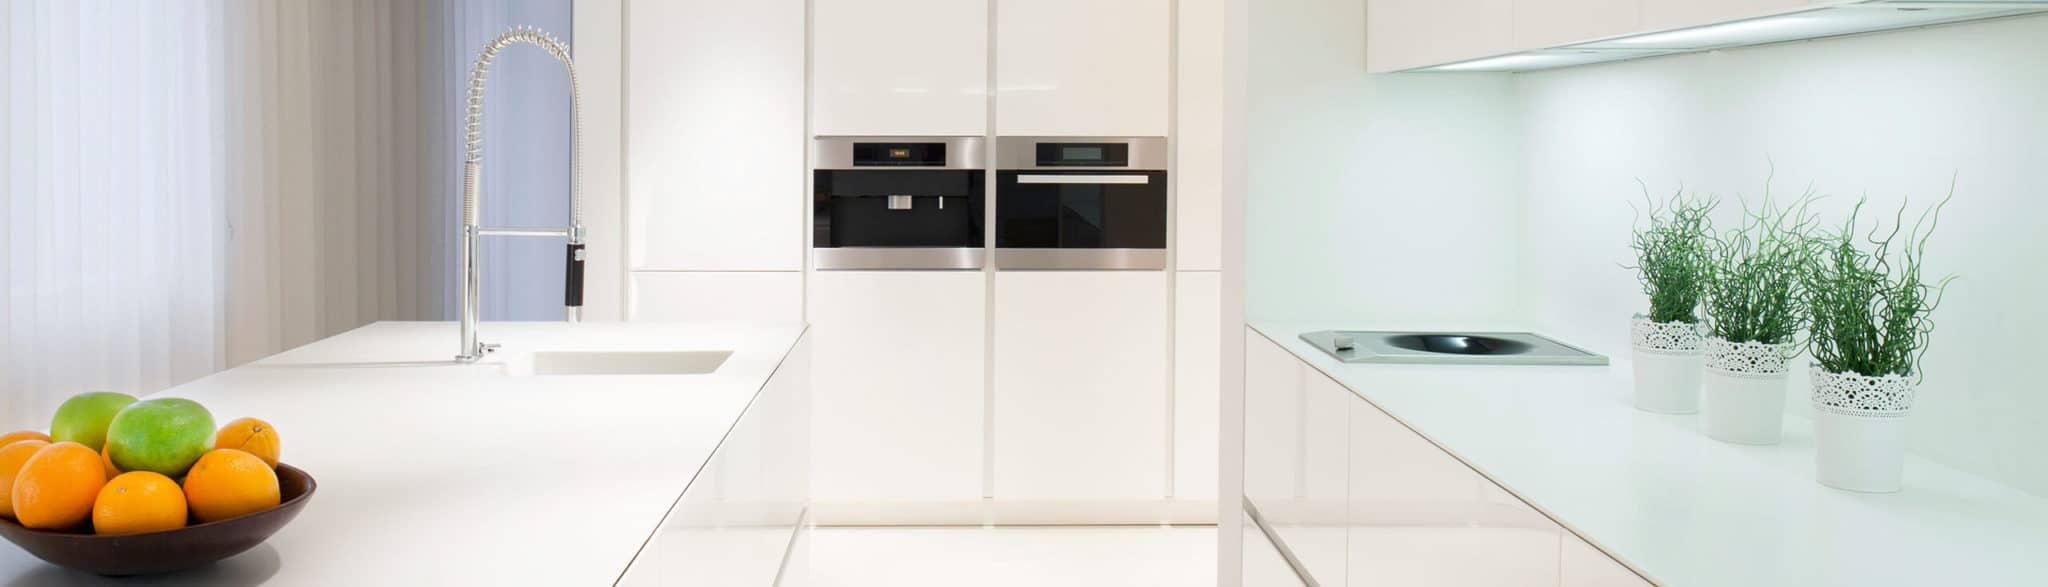 Nice fabricantes muebles de cocina photos fabricantes - Fabricantes de cocinas ...